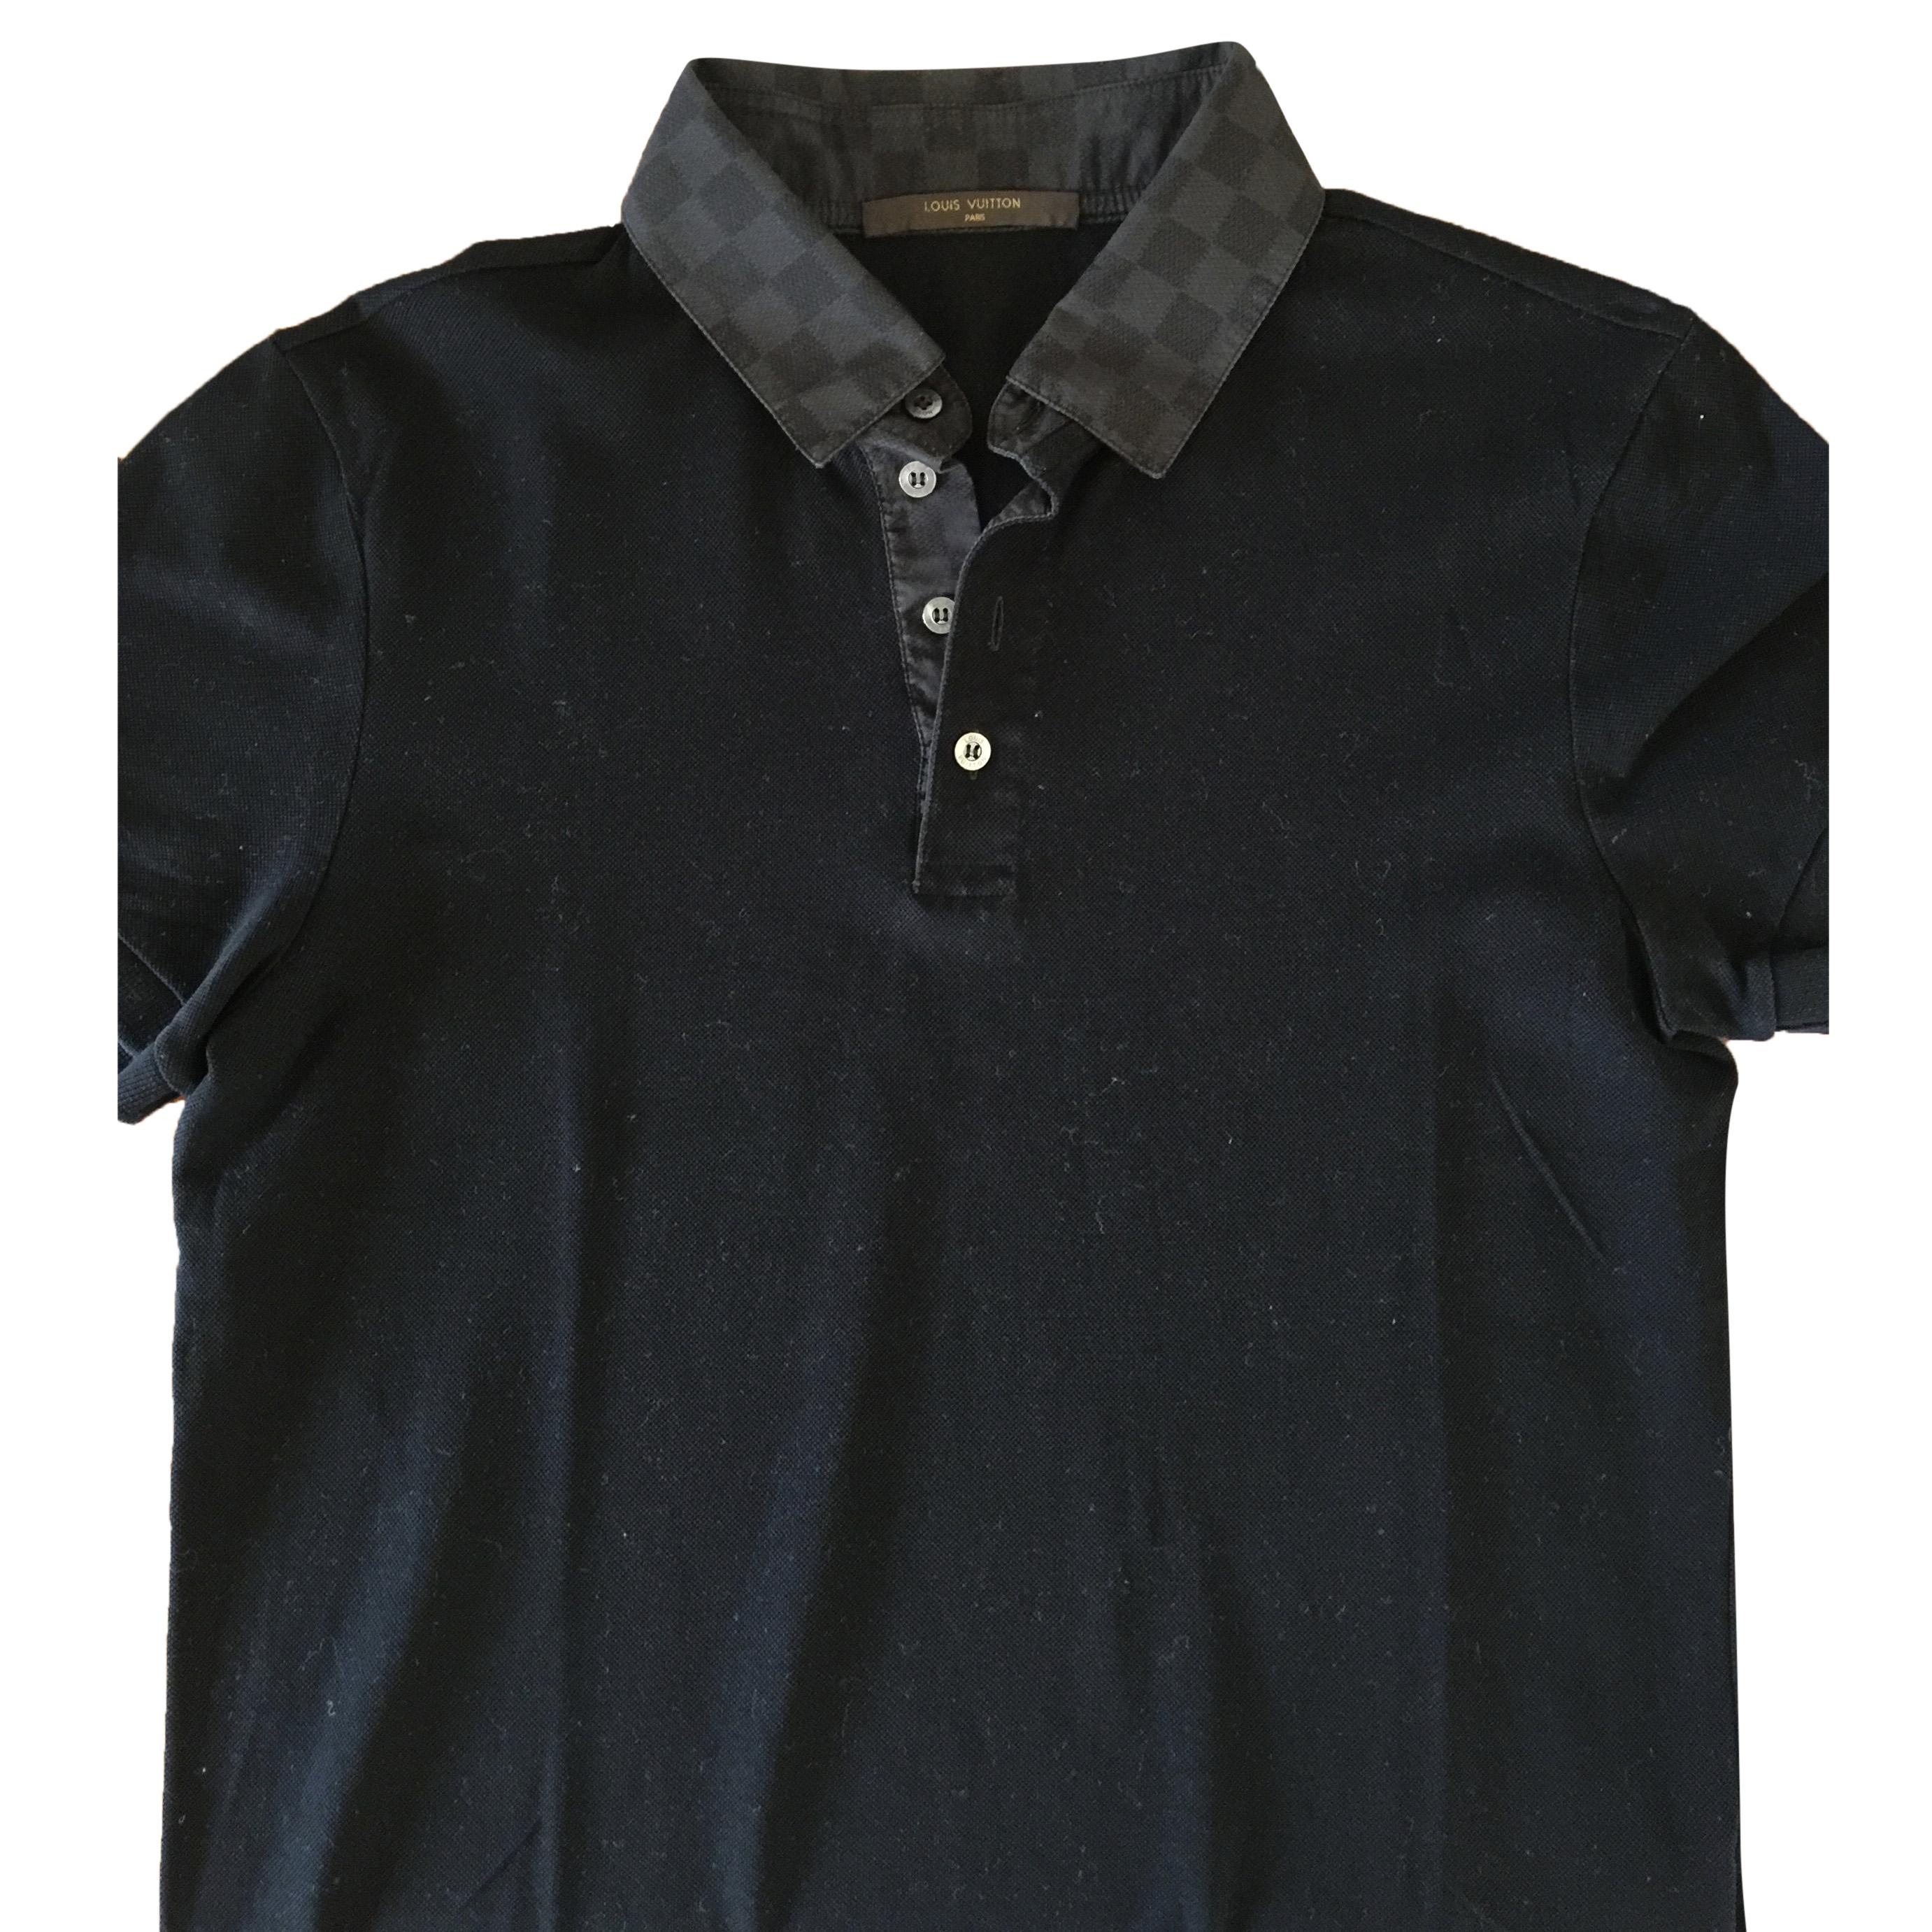 2ca7c299 Louis Vuitton Mens Damier Graphite Polo Shirt | HEWI London